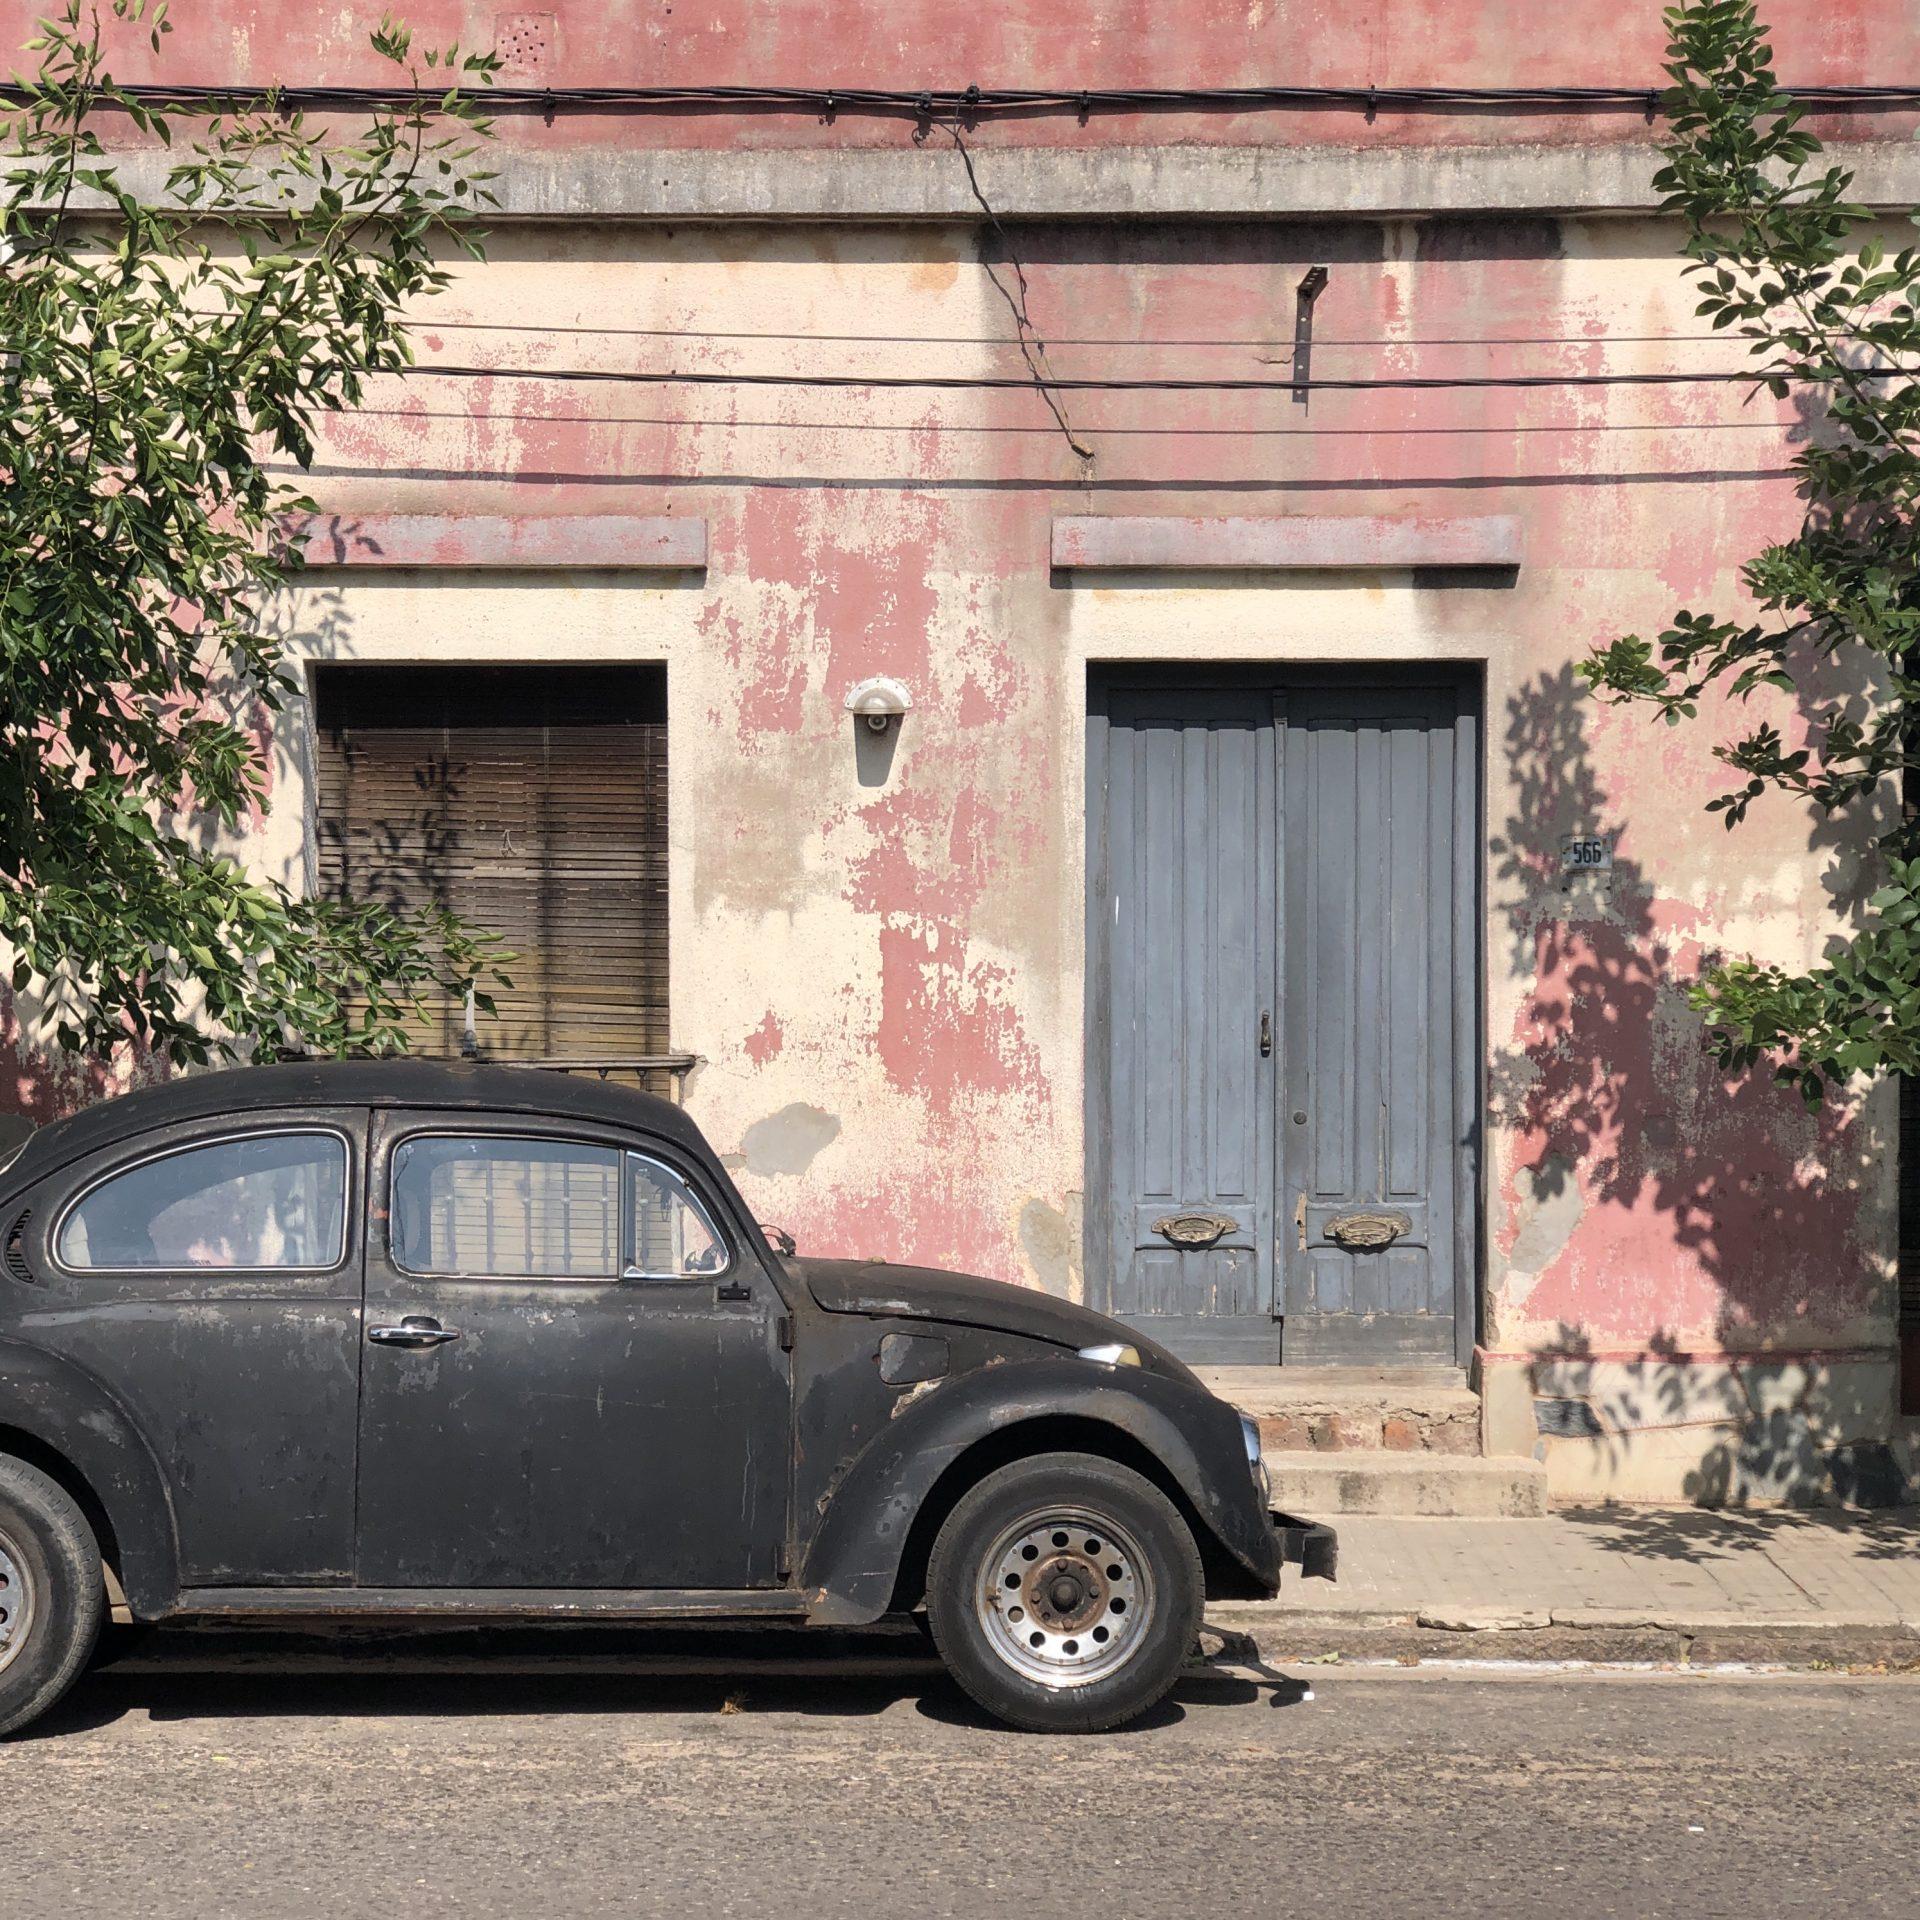 Haus und Auto in Melo, Uruguay